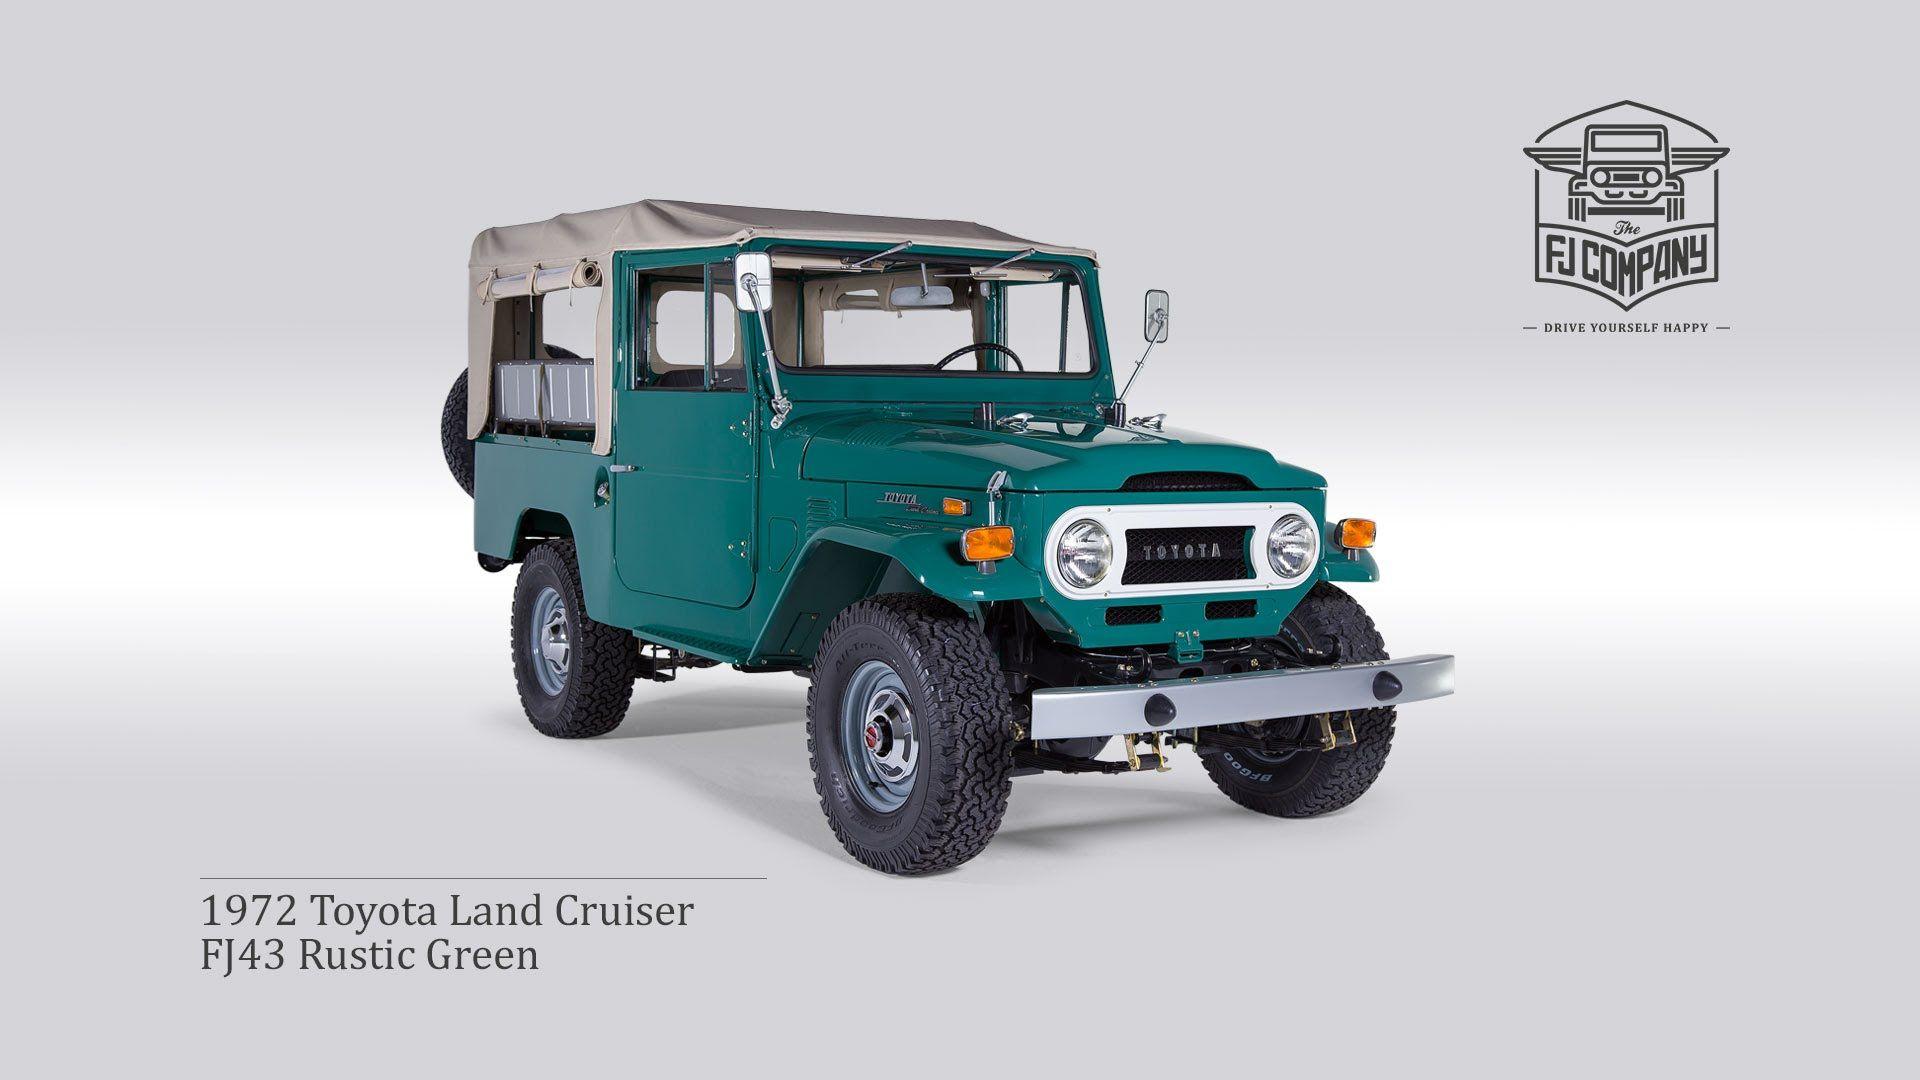 Resultado De Imagem Para Toyota Industrial Factory Oldest T 1973 Fj55 Land Cruiser 1972 Fj43 Rustic Green Fhd